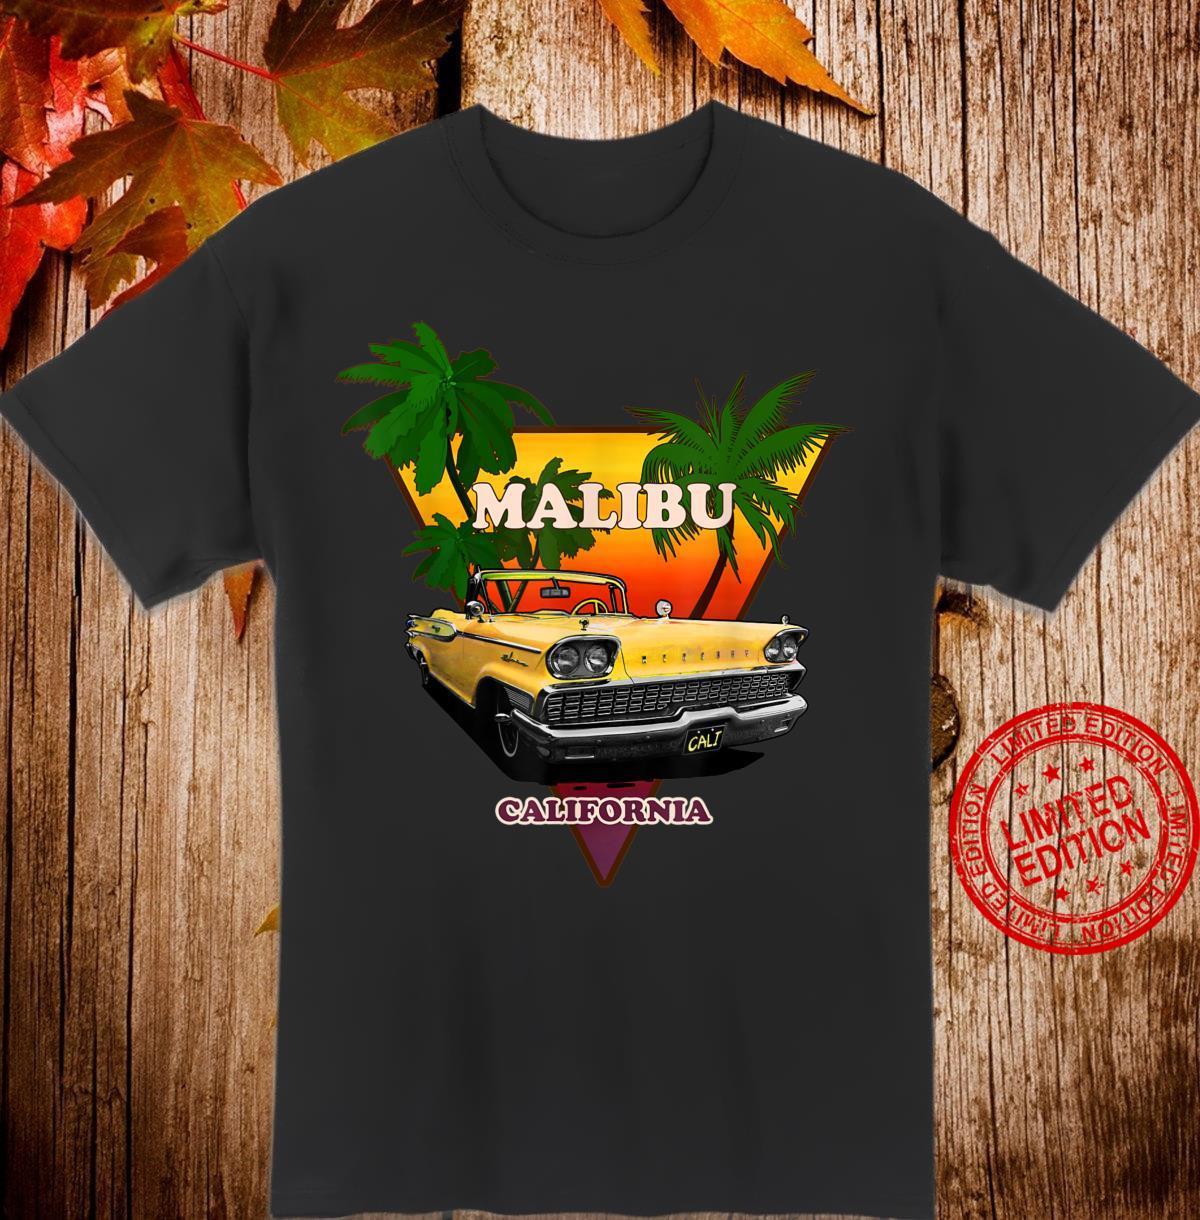 California Malibu Aesthetic Retro Design Vintage Car Shirt